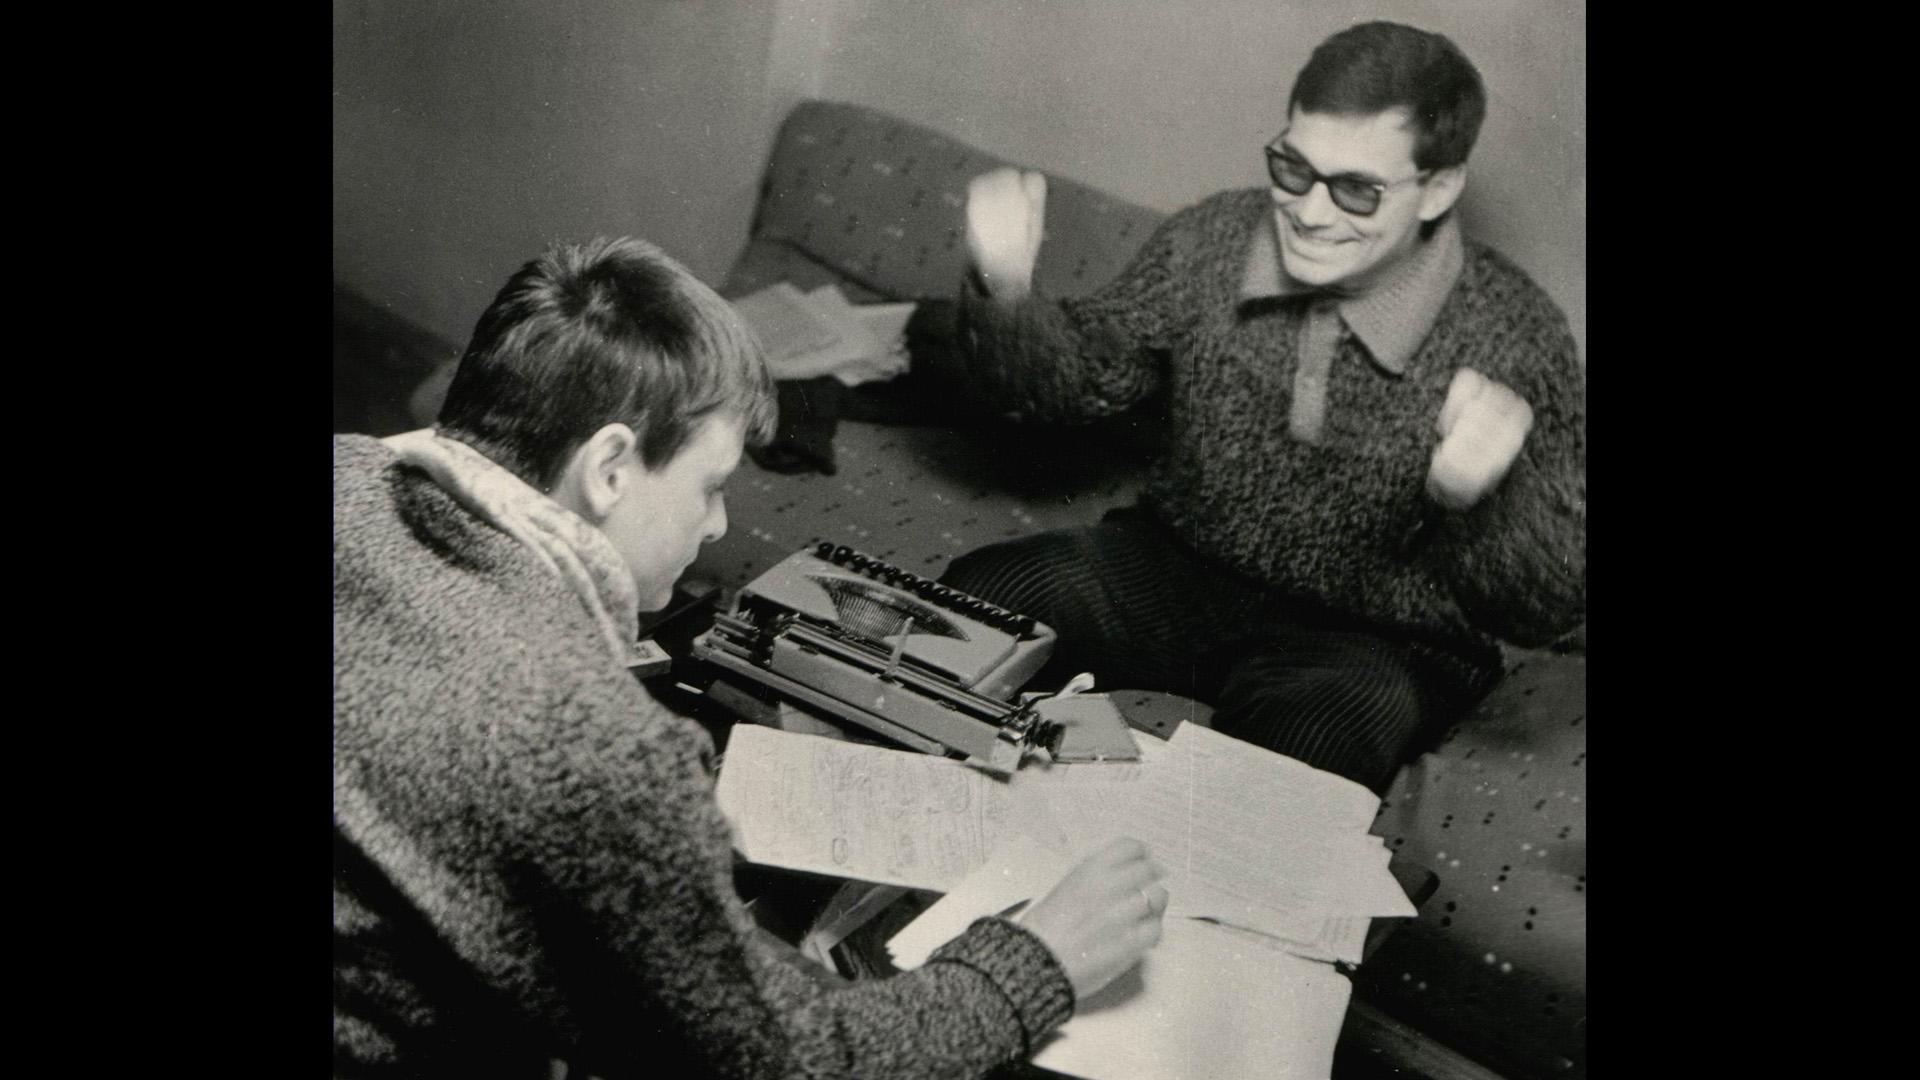 Andrei Tarkovsky and Andrei Konchalovsky, courtesy Andrei Konchalovsky personal collection